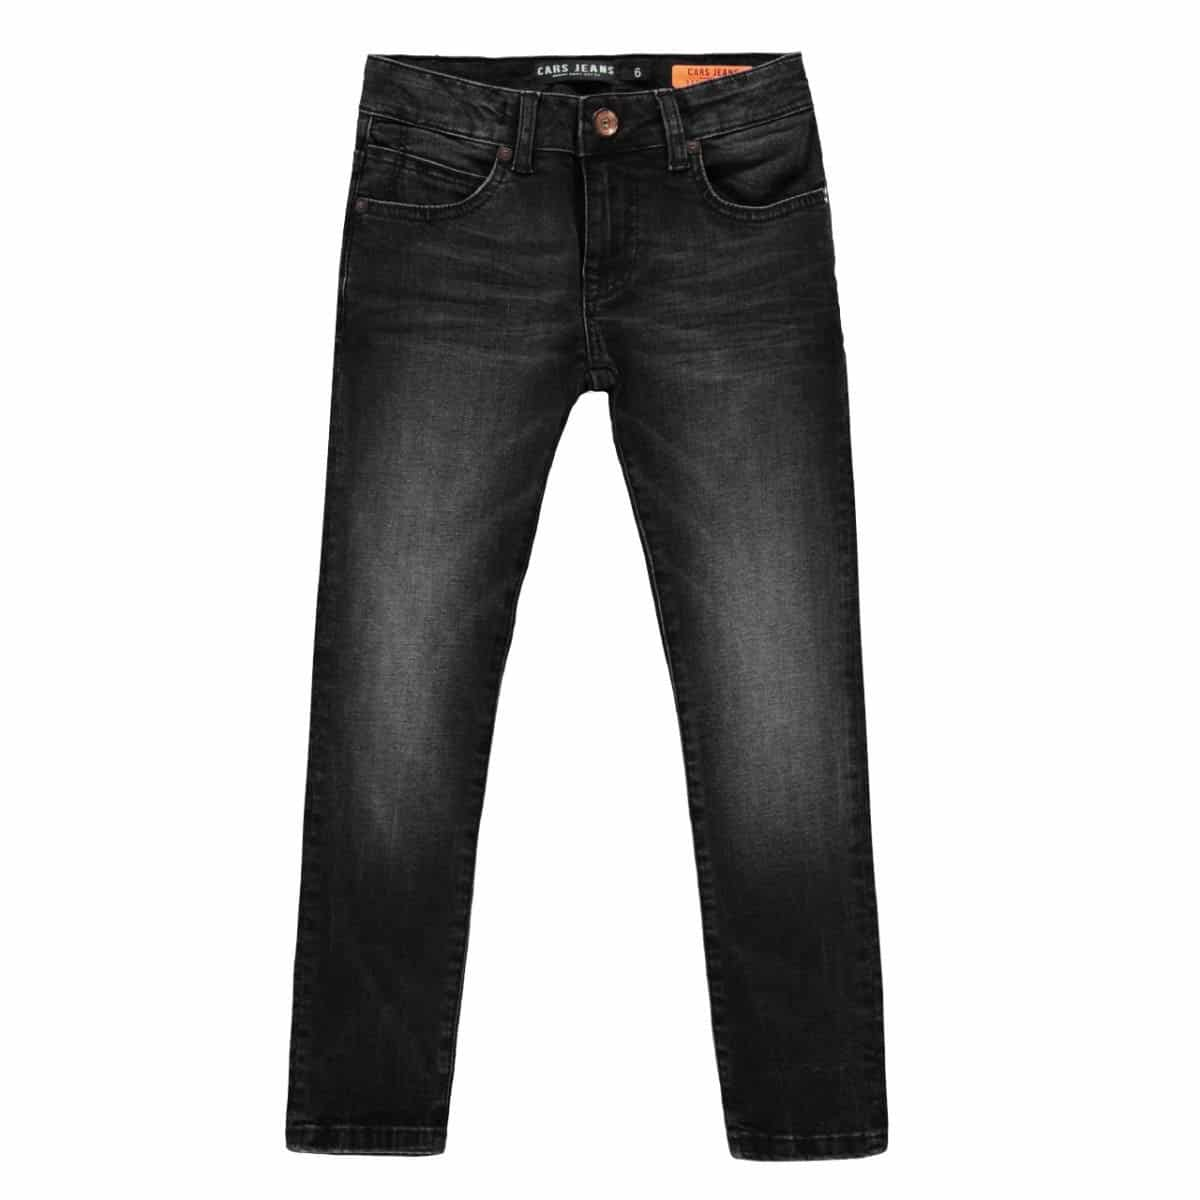 Cars Jeans Davis Black Used